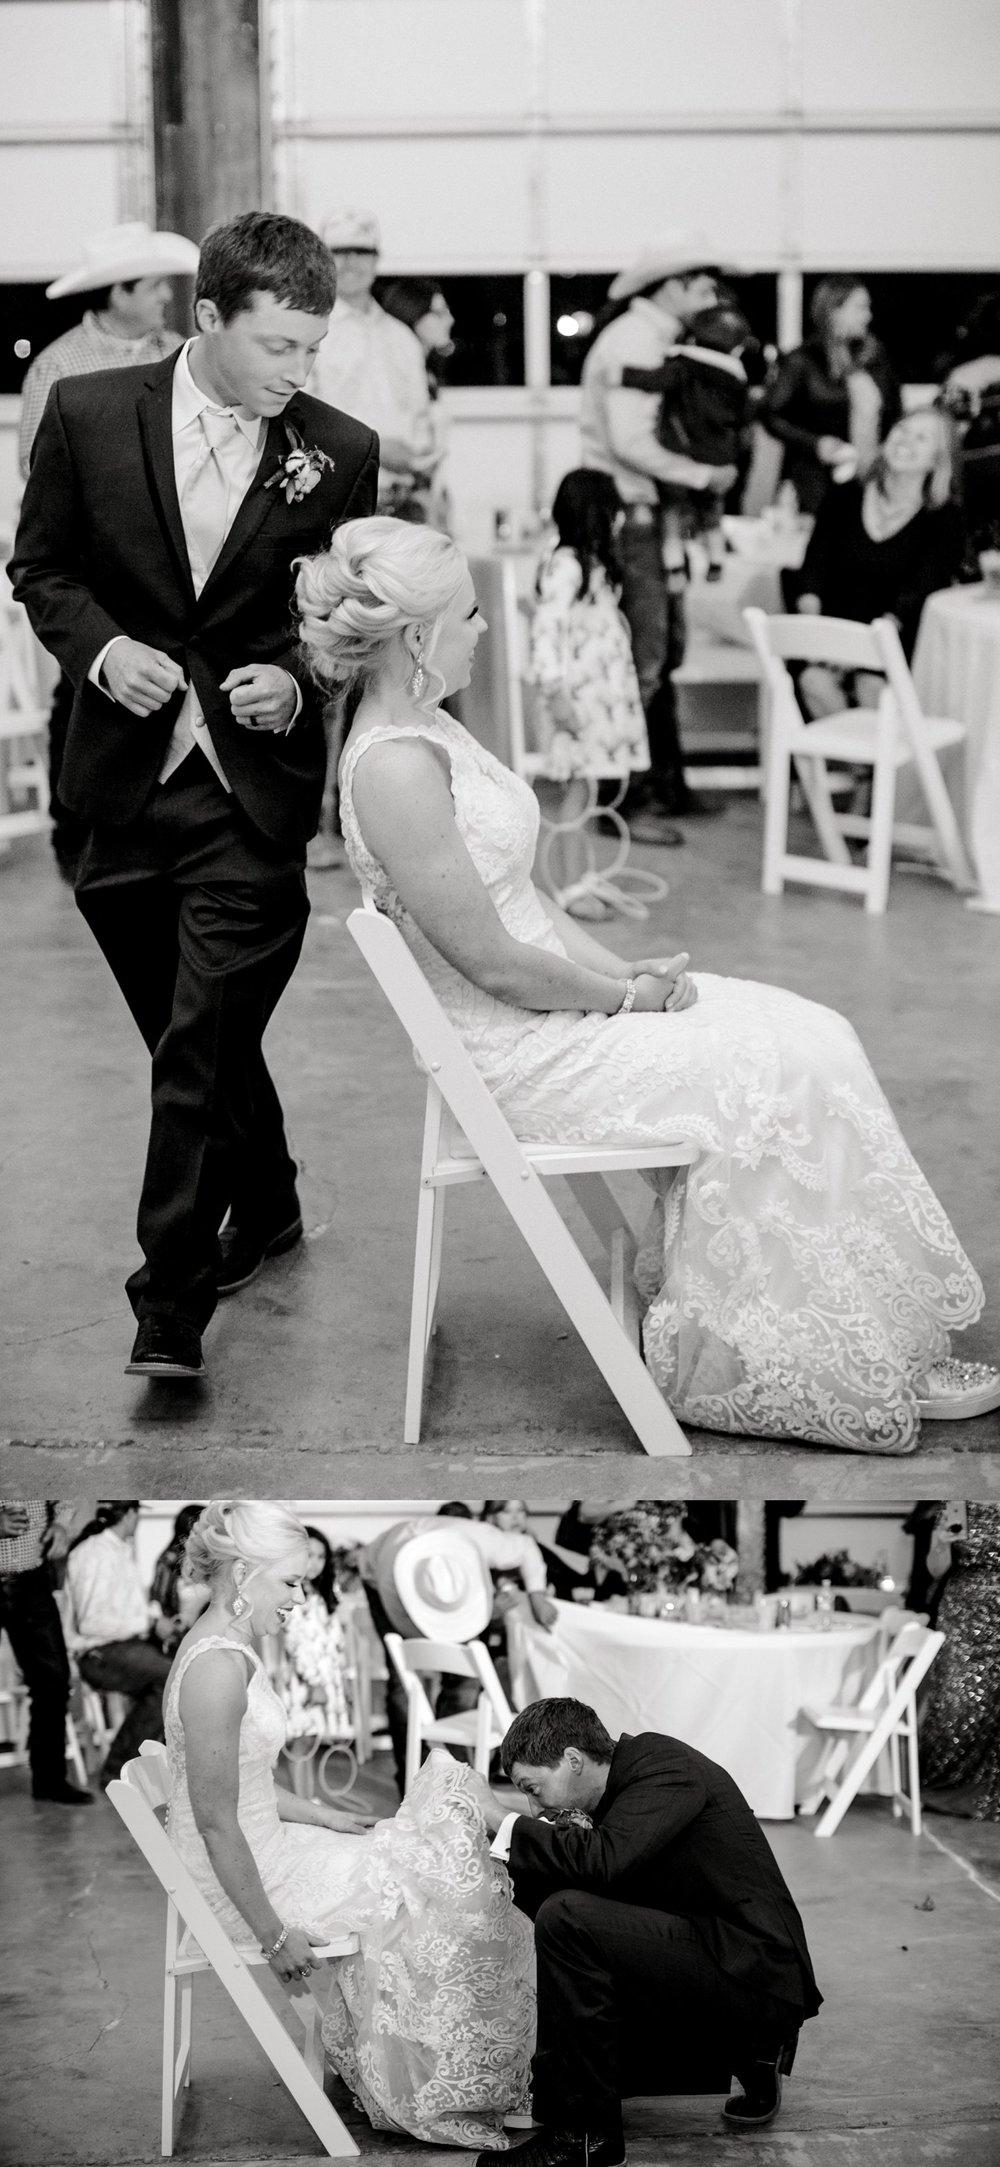 Jenna-and-garrett-Everett-kitalou-gin-lubbock-wedding-dayspring-designs-lubbock-wedding-photographer_0184.jpg